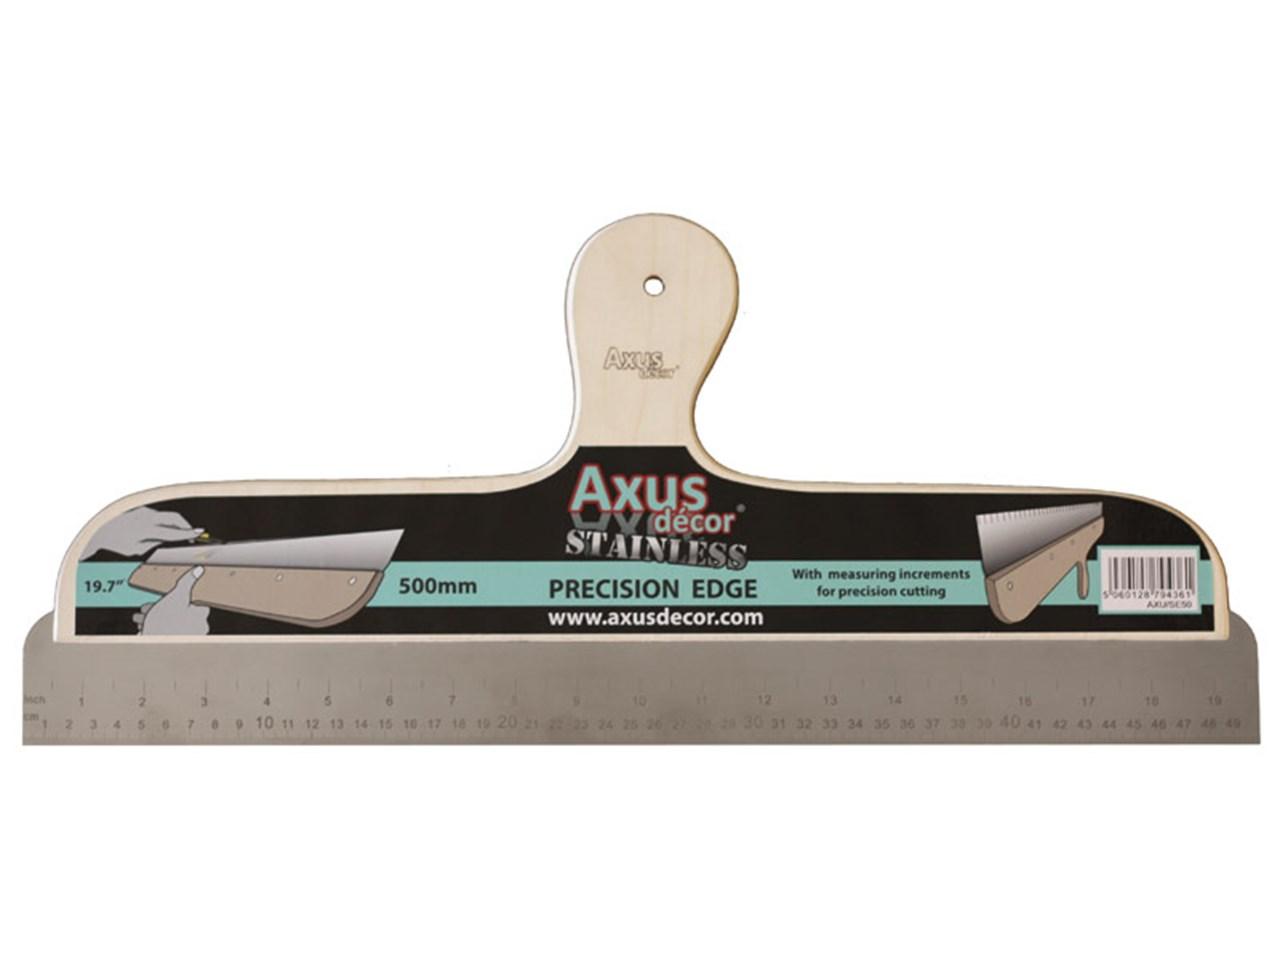 Axus Decor Axuse50 500mm Precision Straight Edge Wallpapering Tool